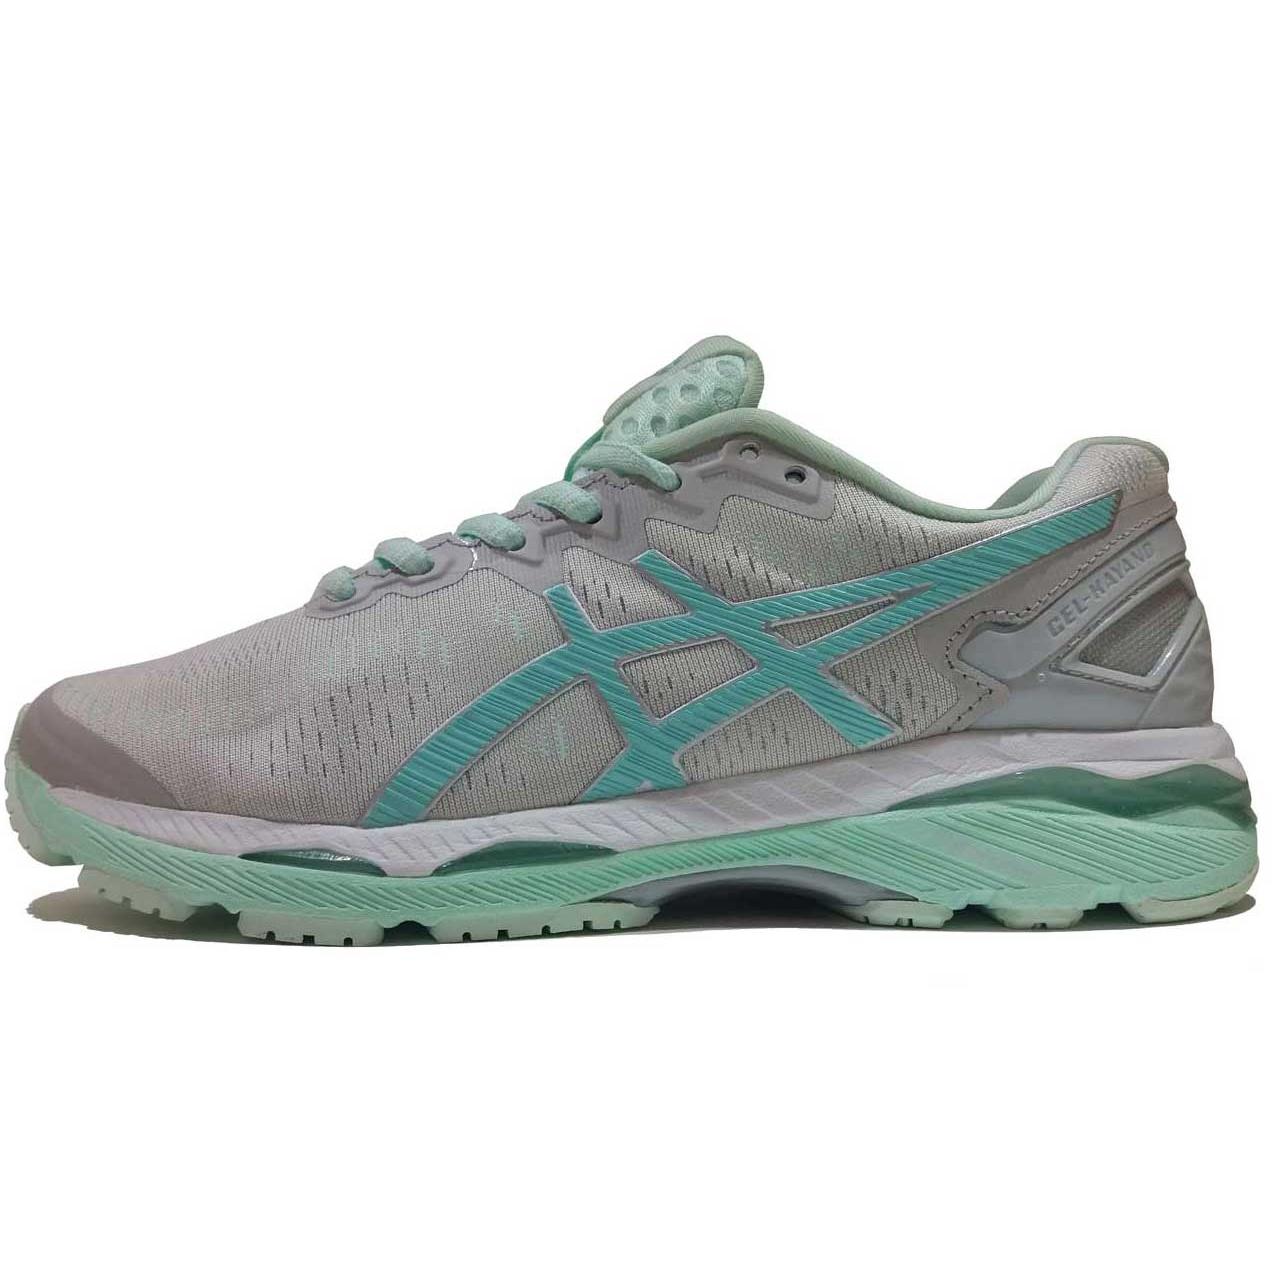 کفش مخصوص دویدن زنانه مدل kayana23 9687/23